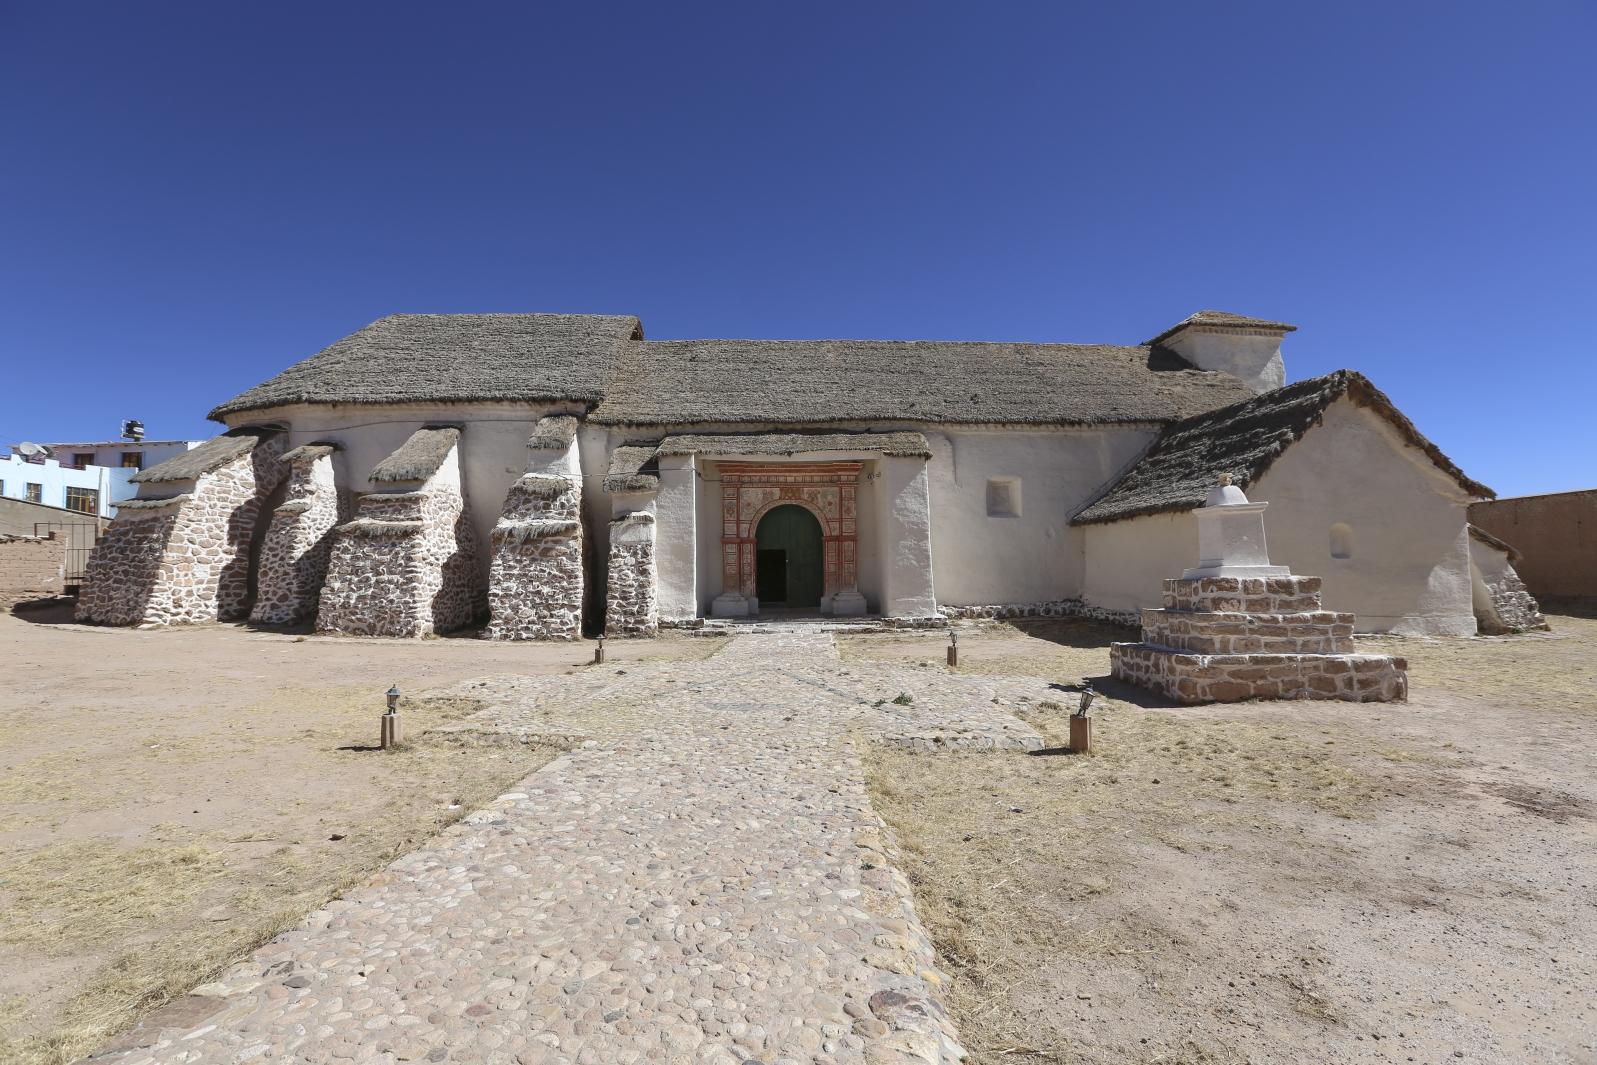 Carahuara de Corangas - eine der ältesten Kirchen Südamerikas